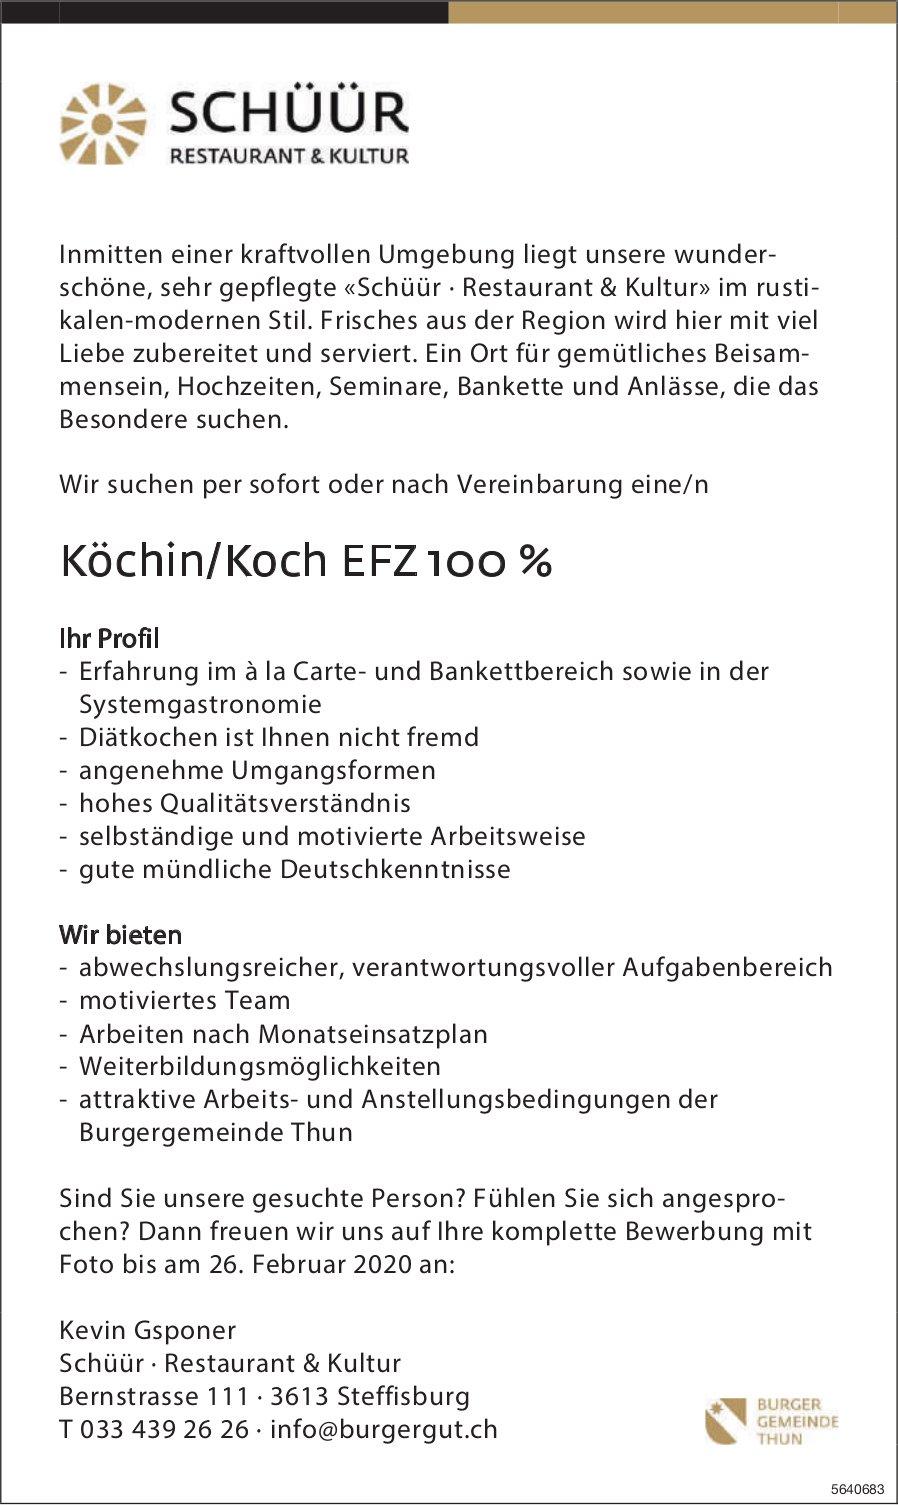 Köchin/Koch EFZ 100 %, Schüür, Restaurant & Kultur, Steffisburg, gesucht